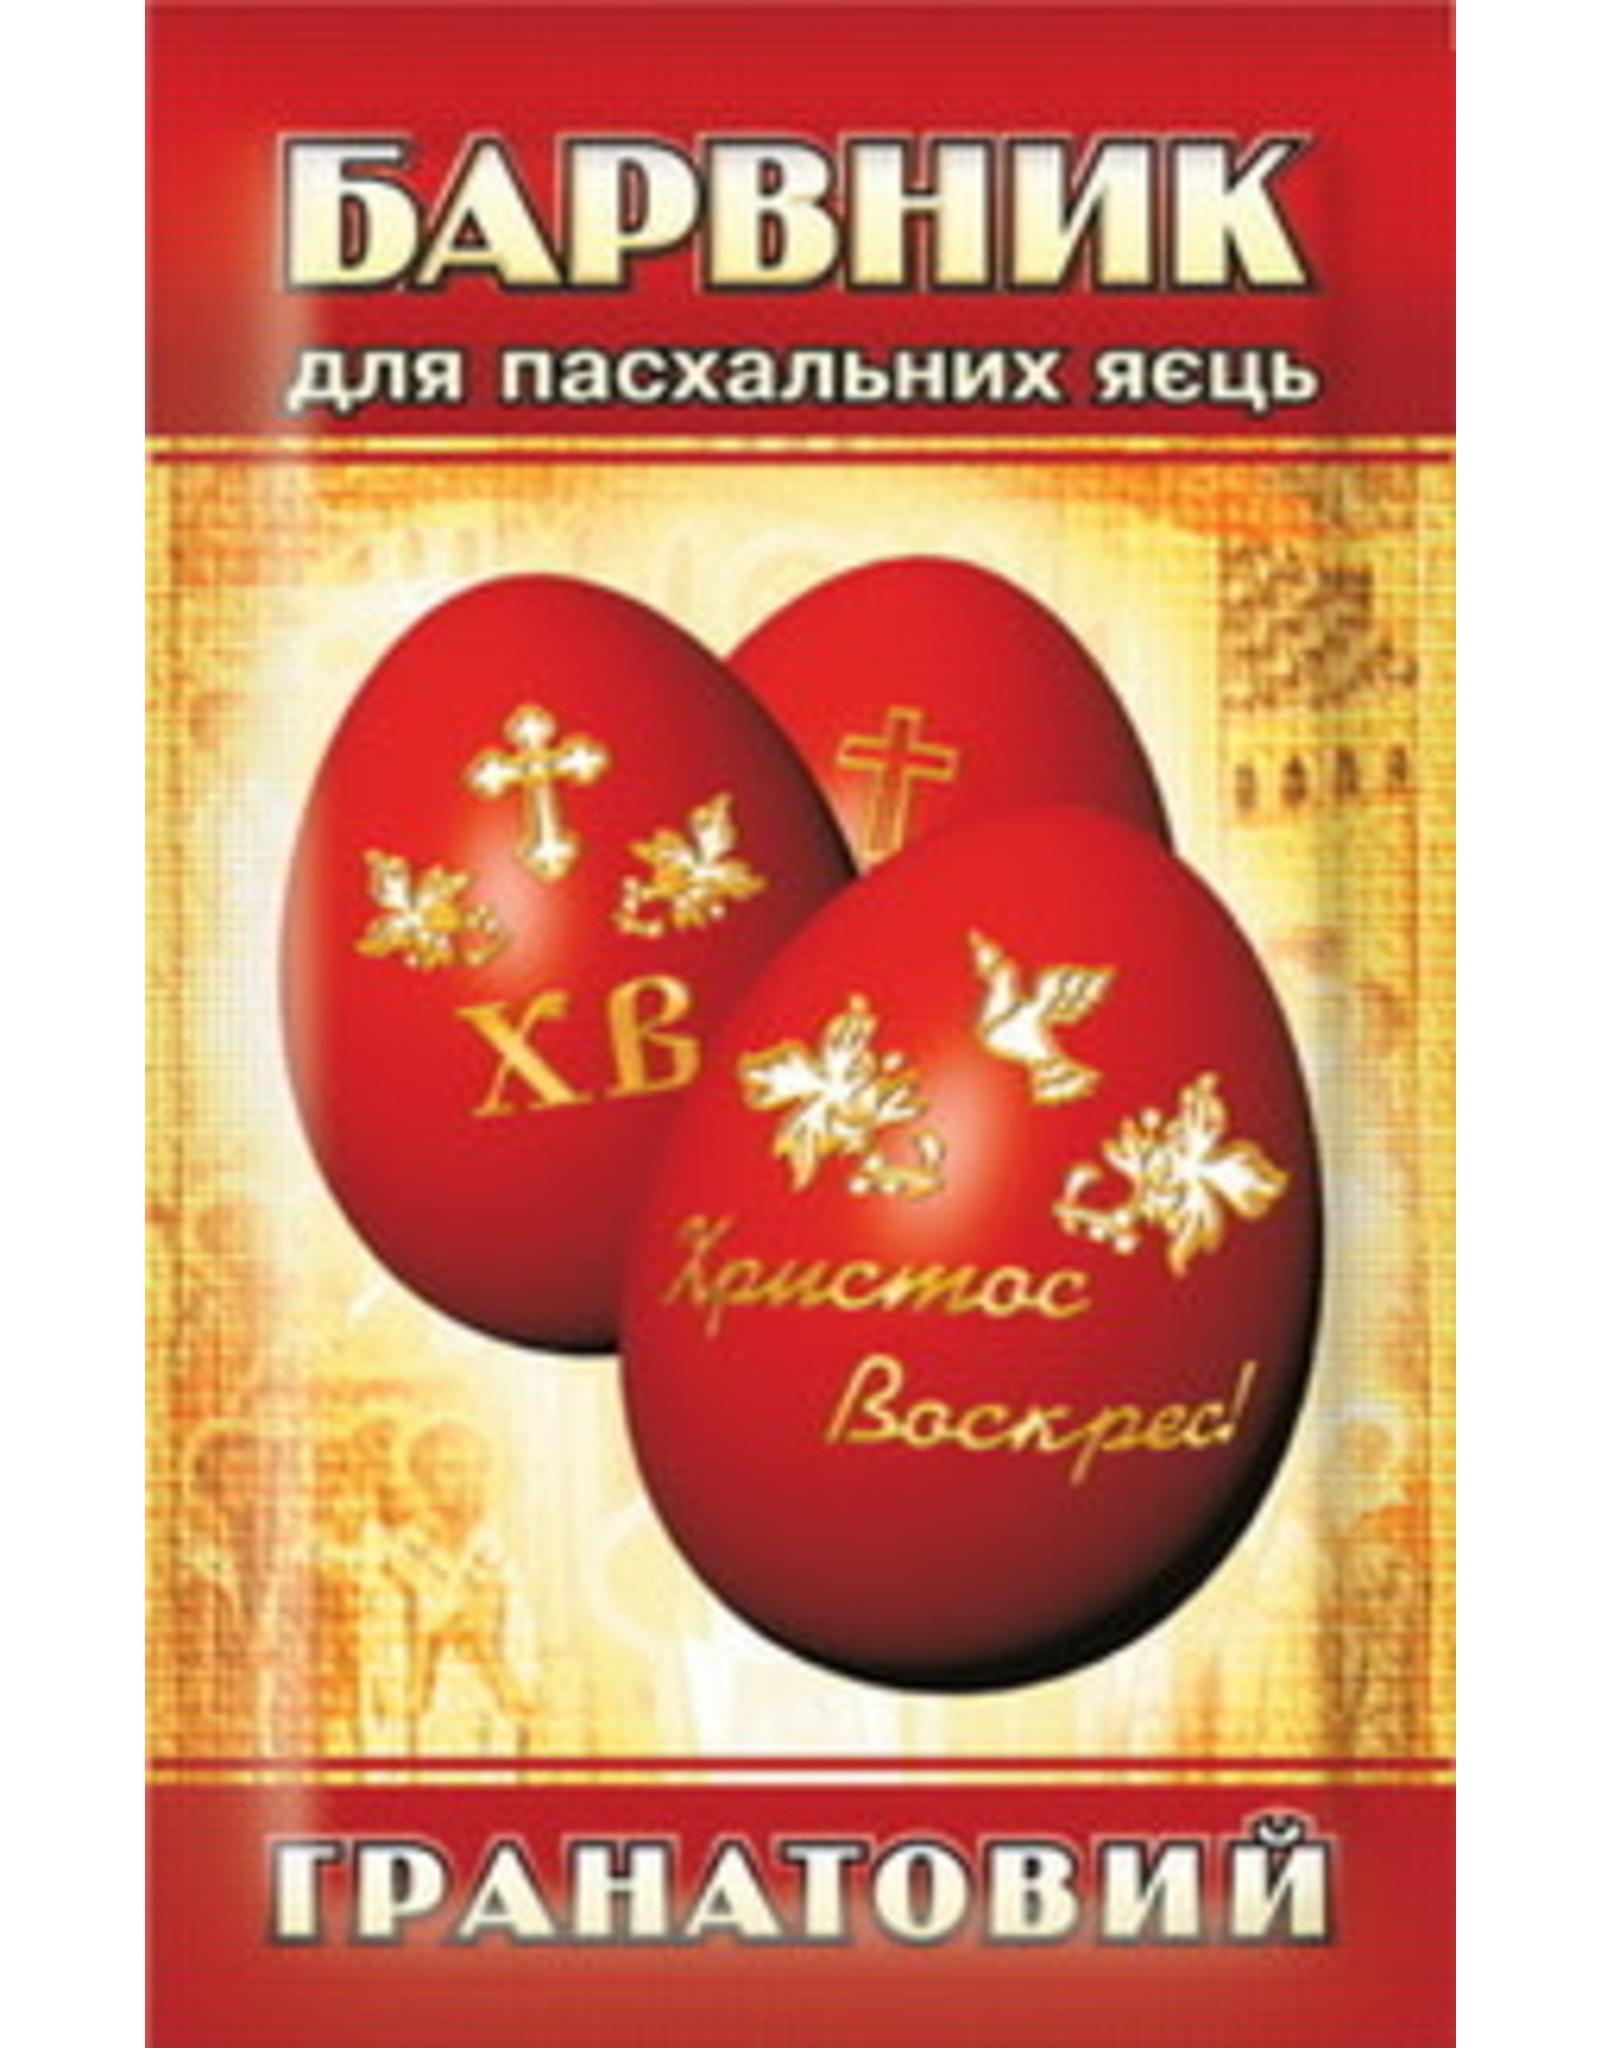 Барвник Для Пасхальних Яєць, Гранатовий